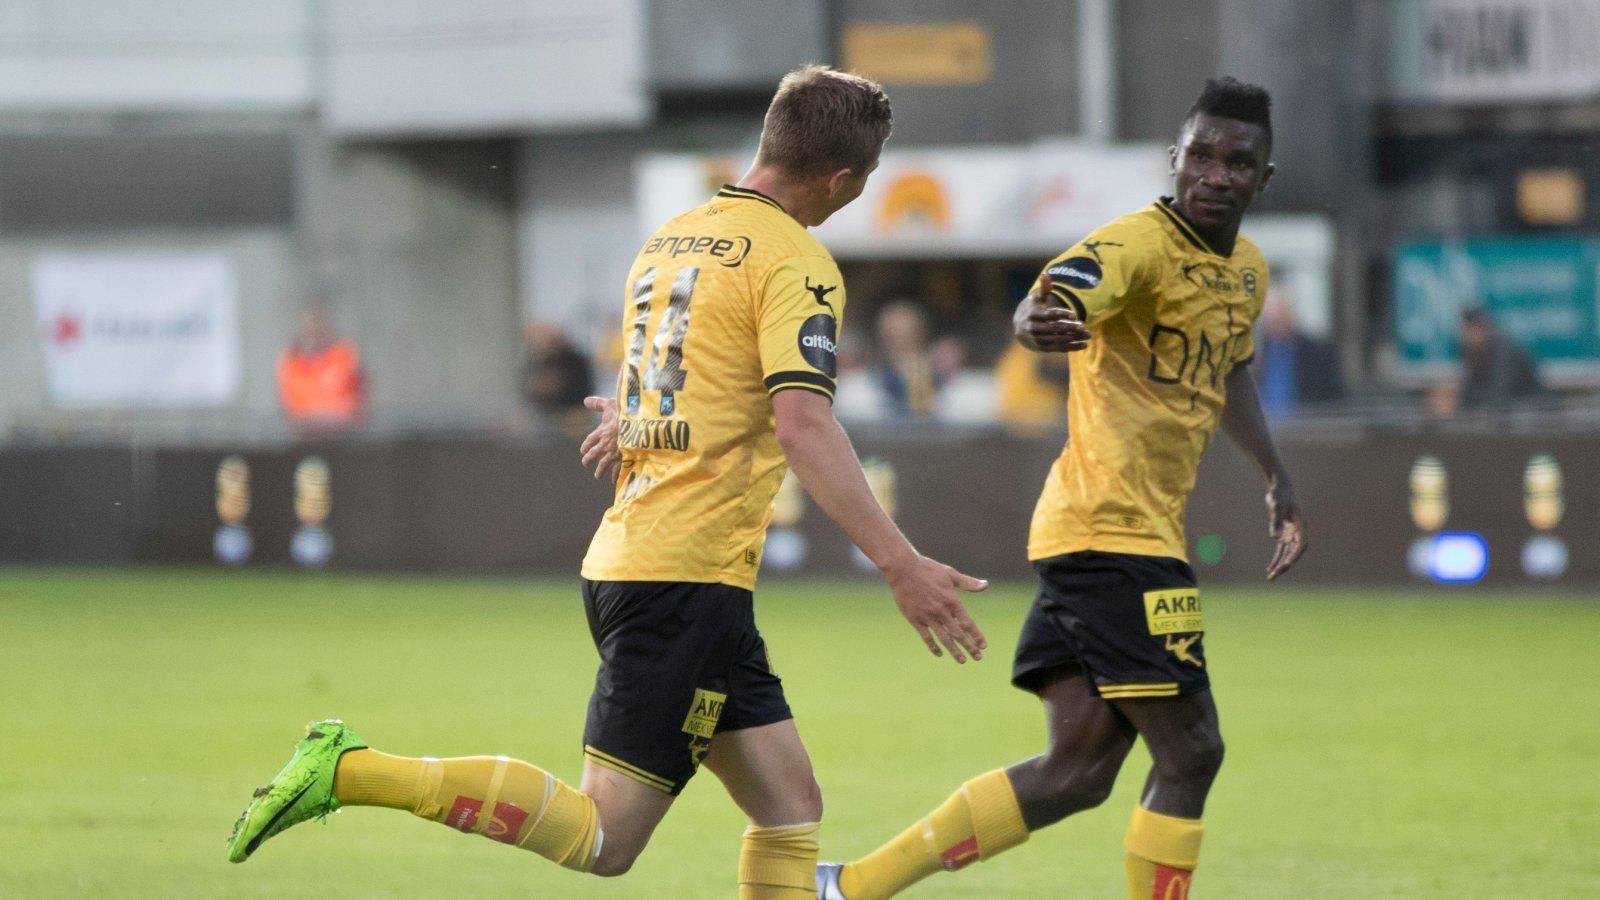 Fredrik Krogstad og Ifeanyi Mathew jubler for scoring mot Stabæk